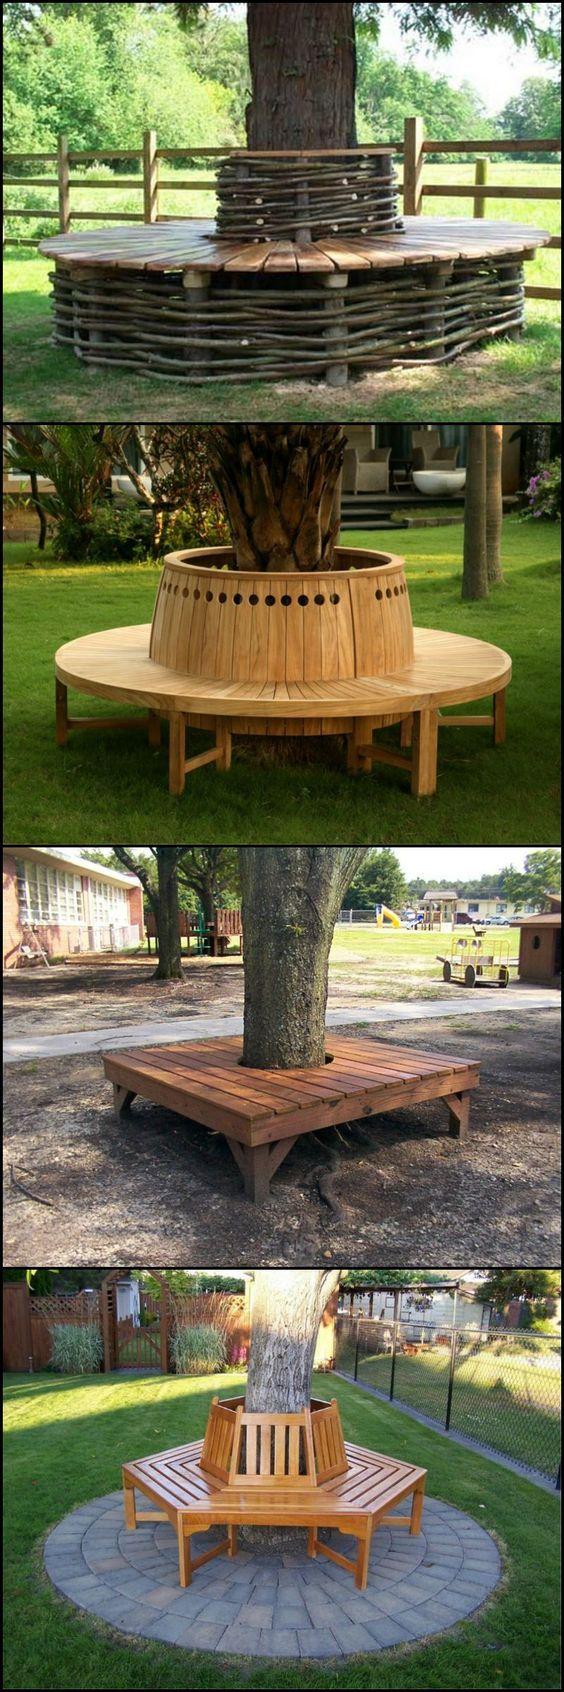 Wrap around tree seated bench design ideas.